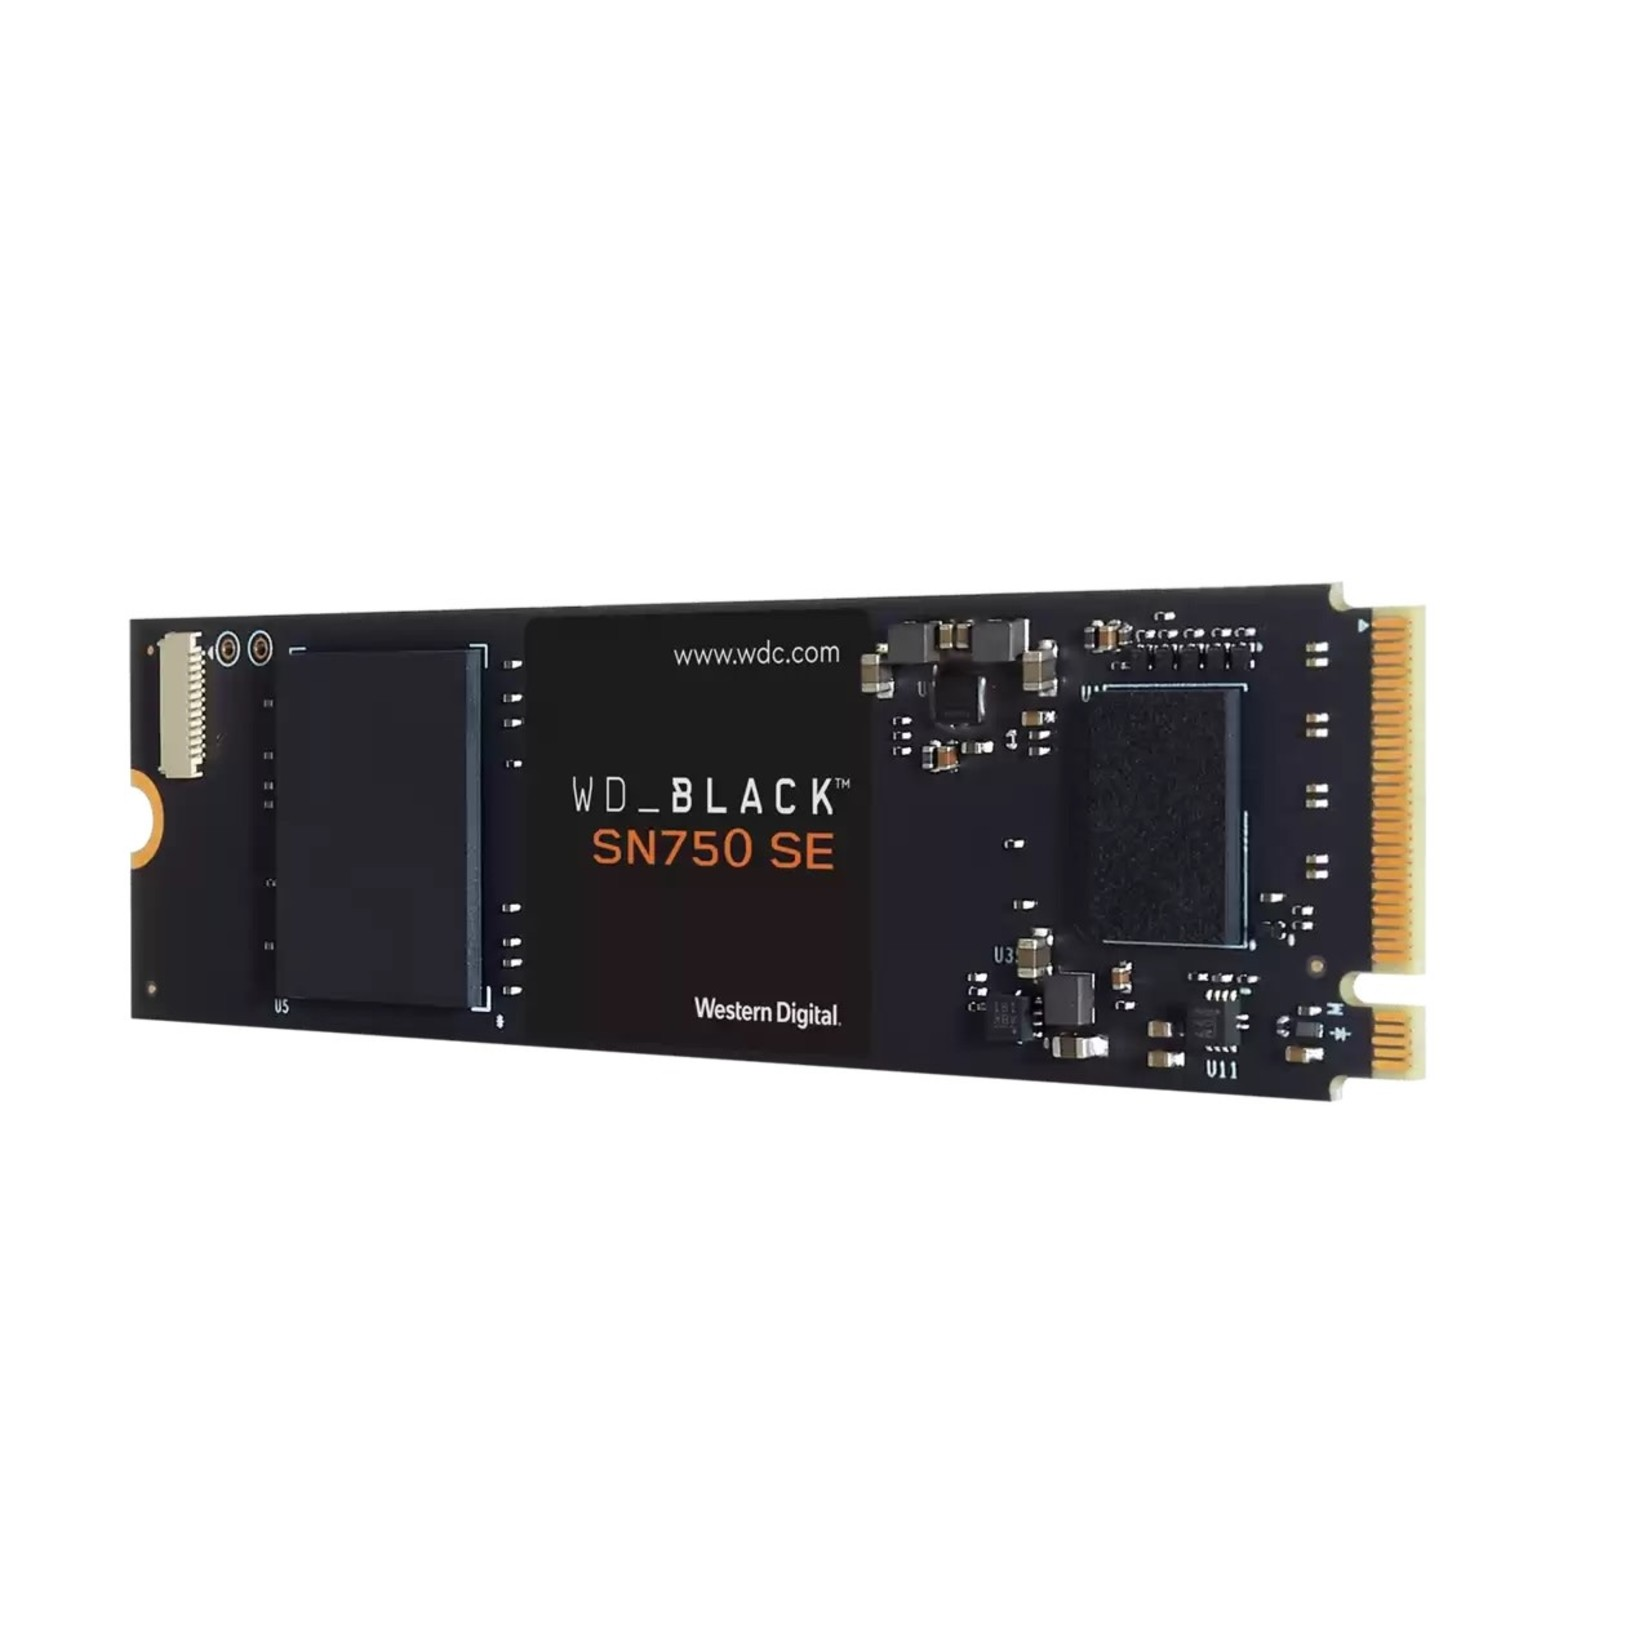 Western Digital WD Black SN750 SE NVMe 1TB SSD